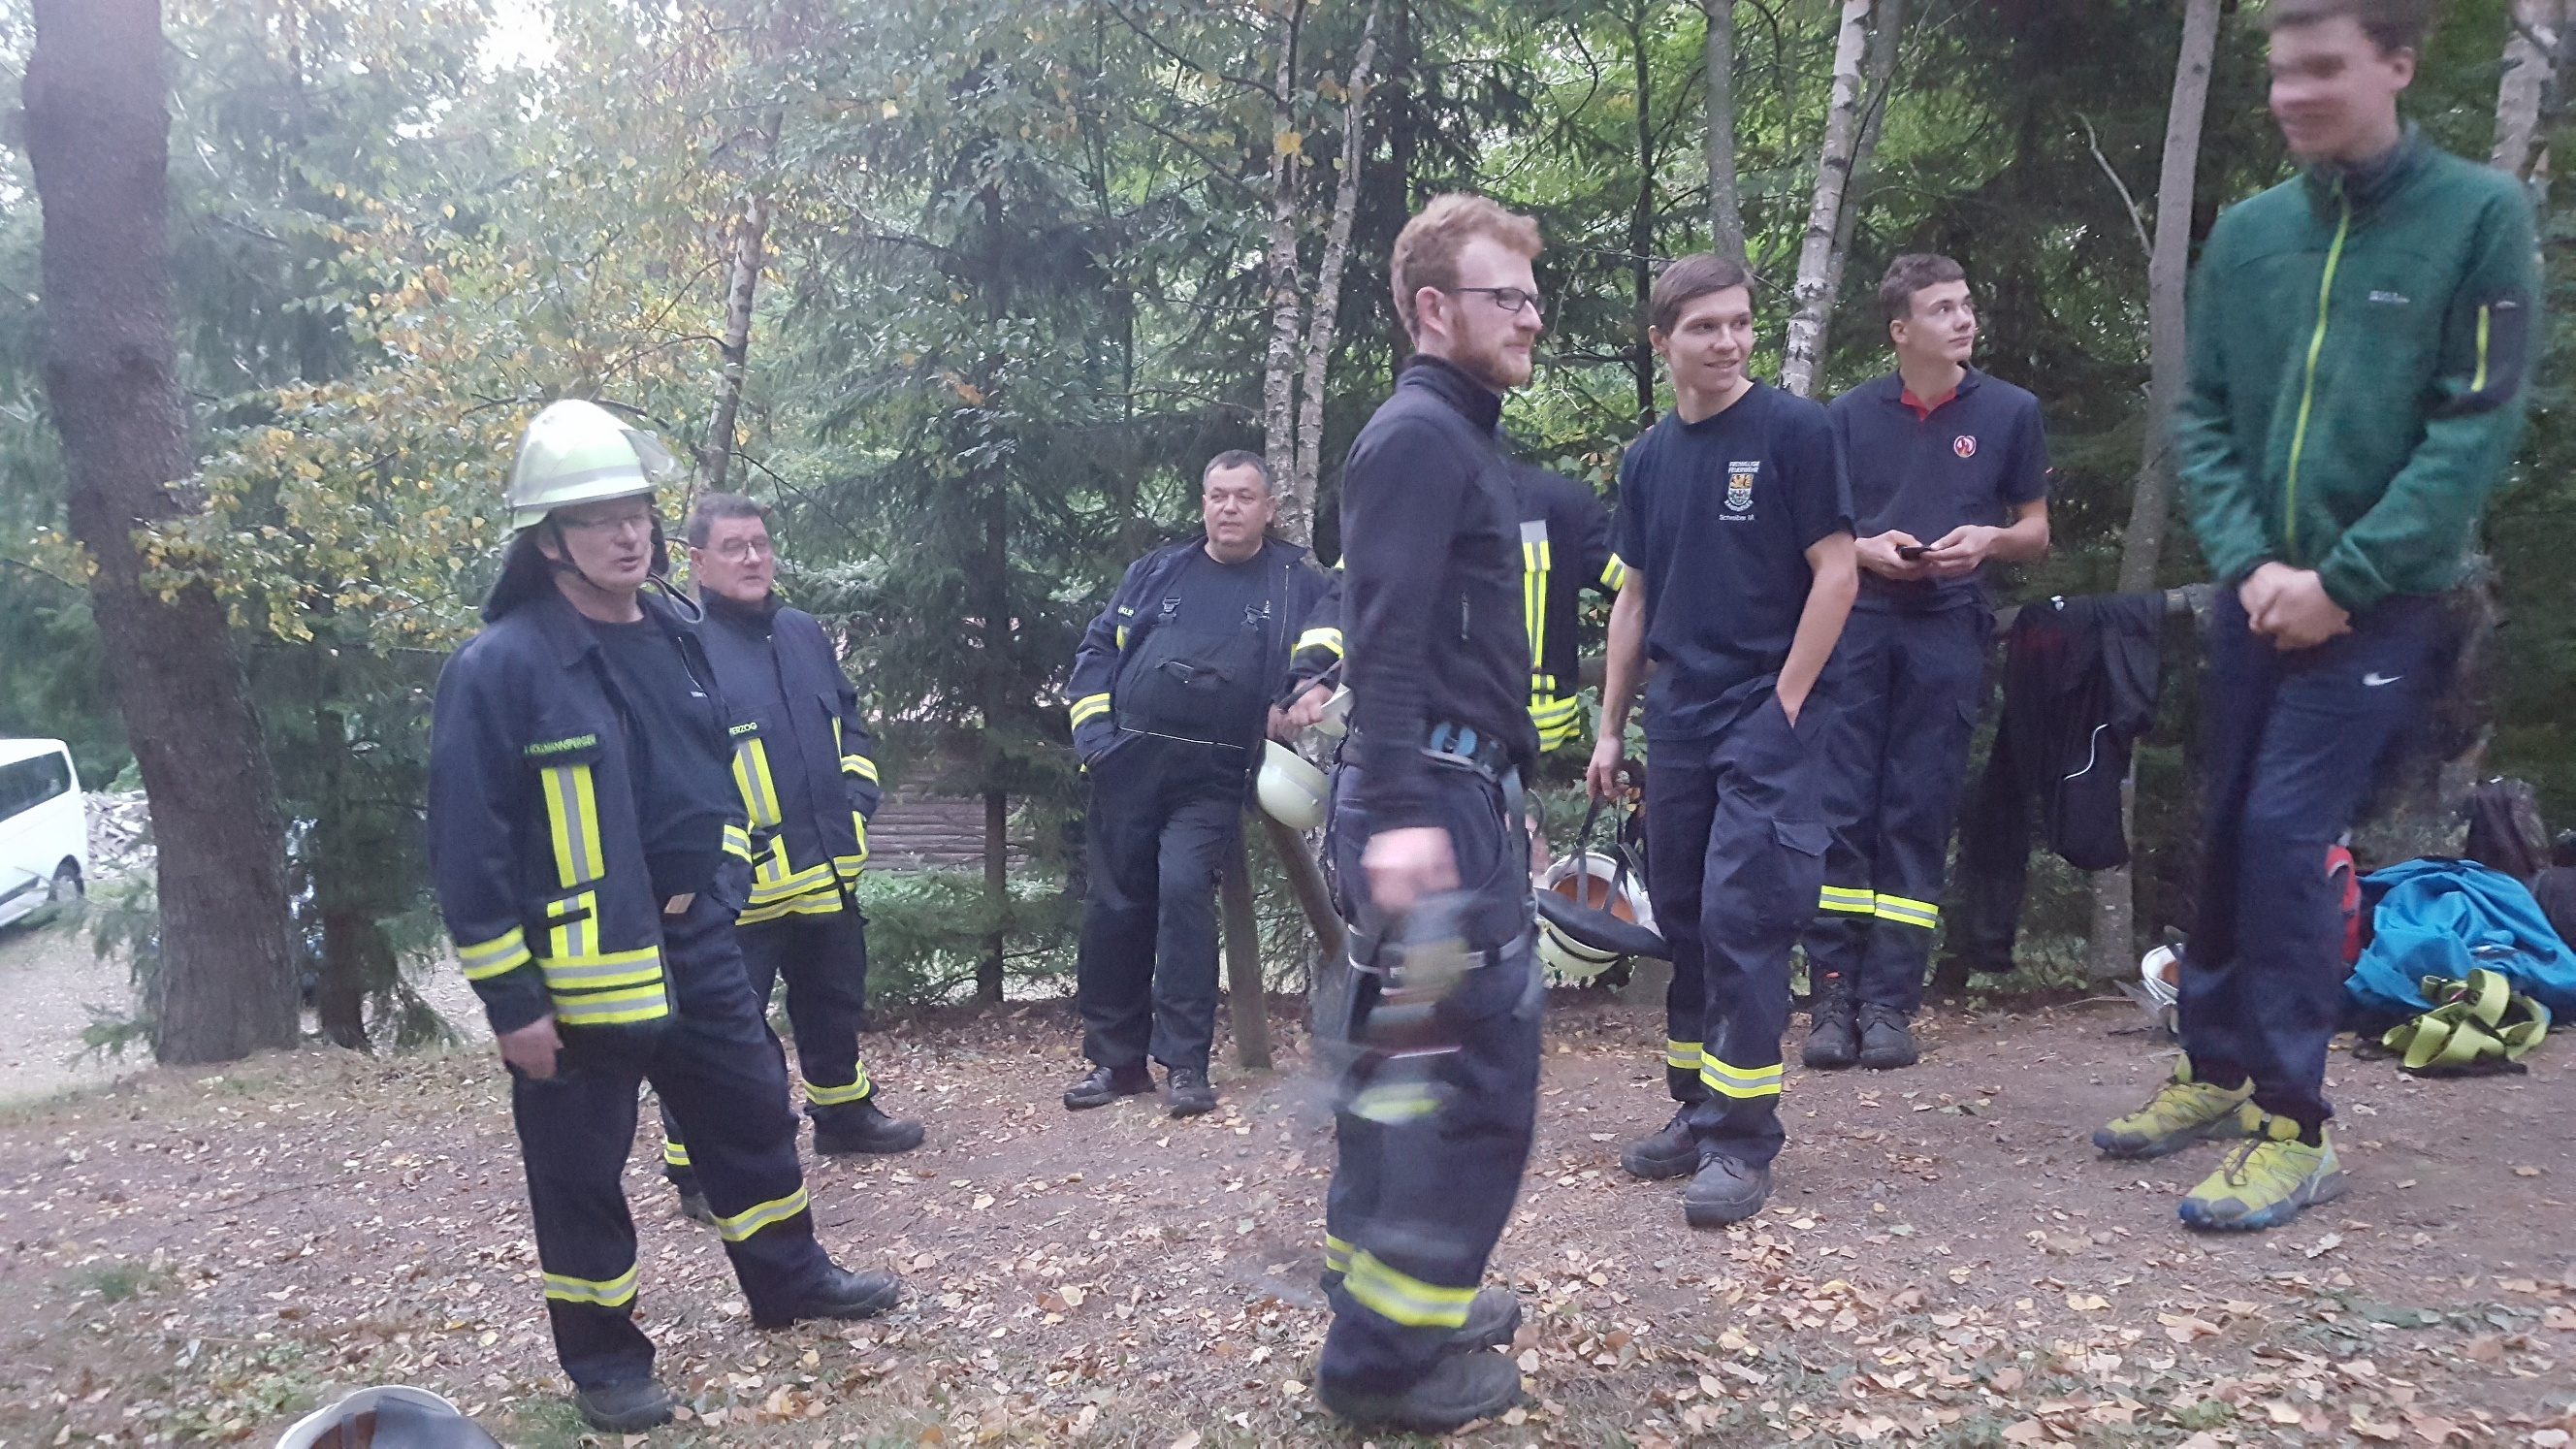 Ransweiler Feuerwehr am Aussichtsturm in Seelen